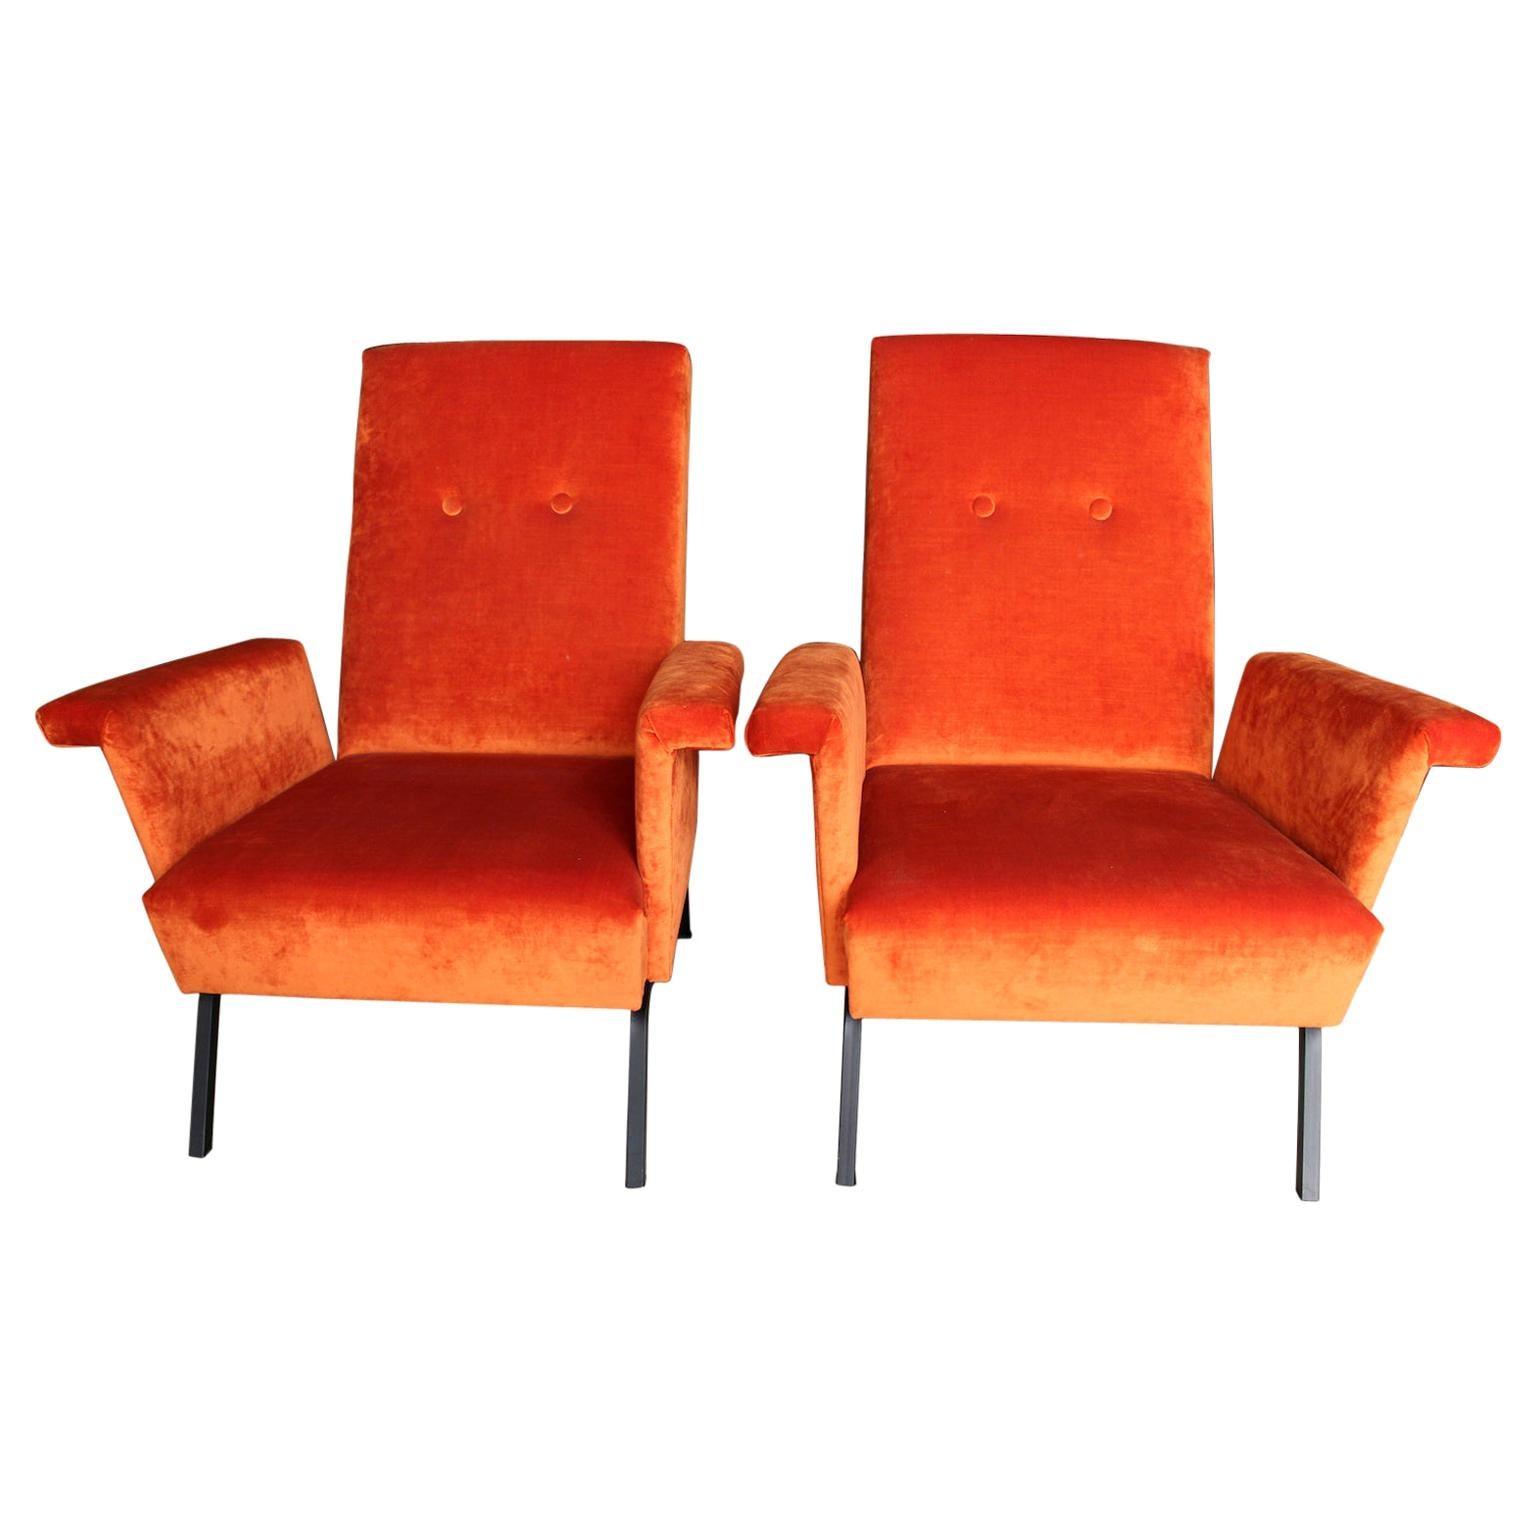 Pair of 1960s Italian Armchairs in Orange Velvet Metal Base